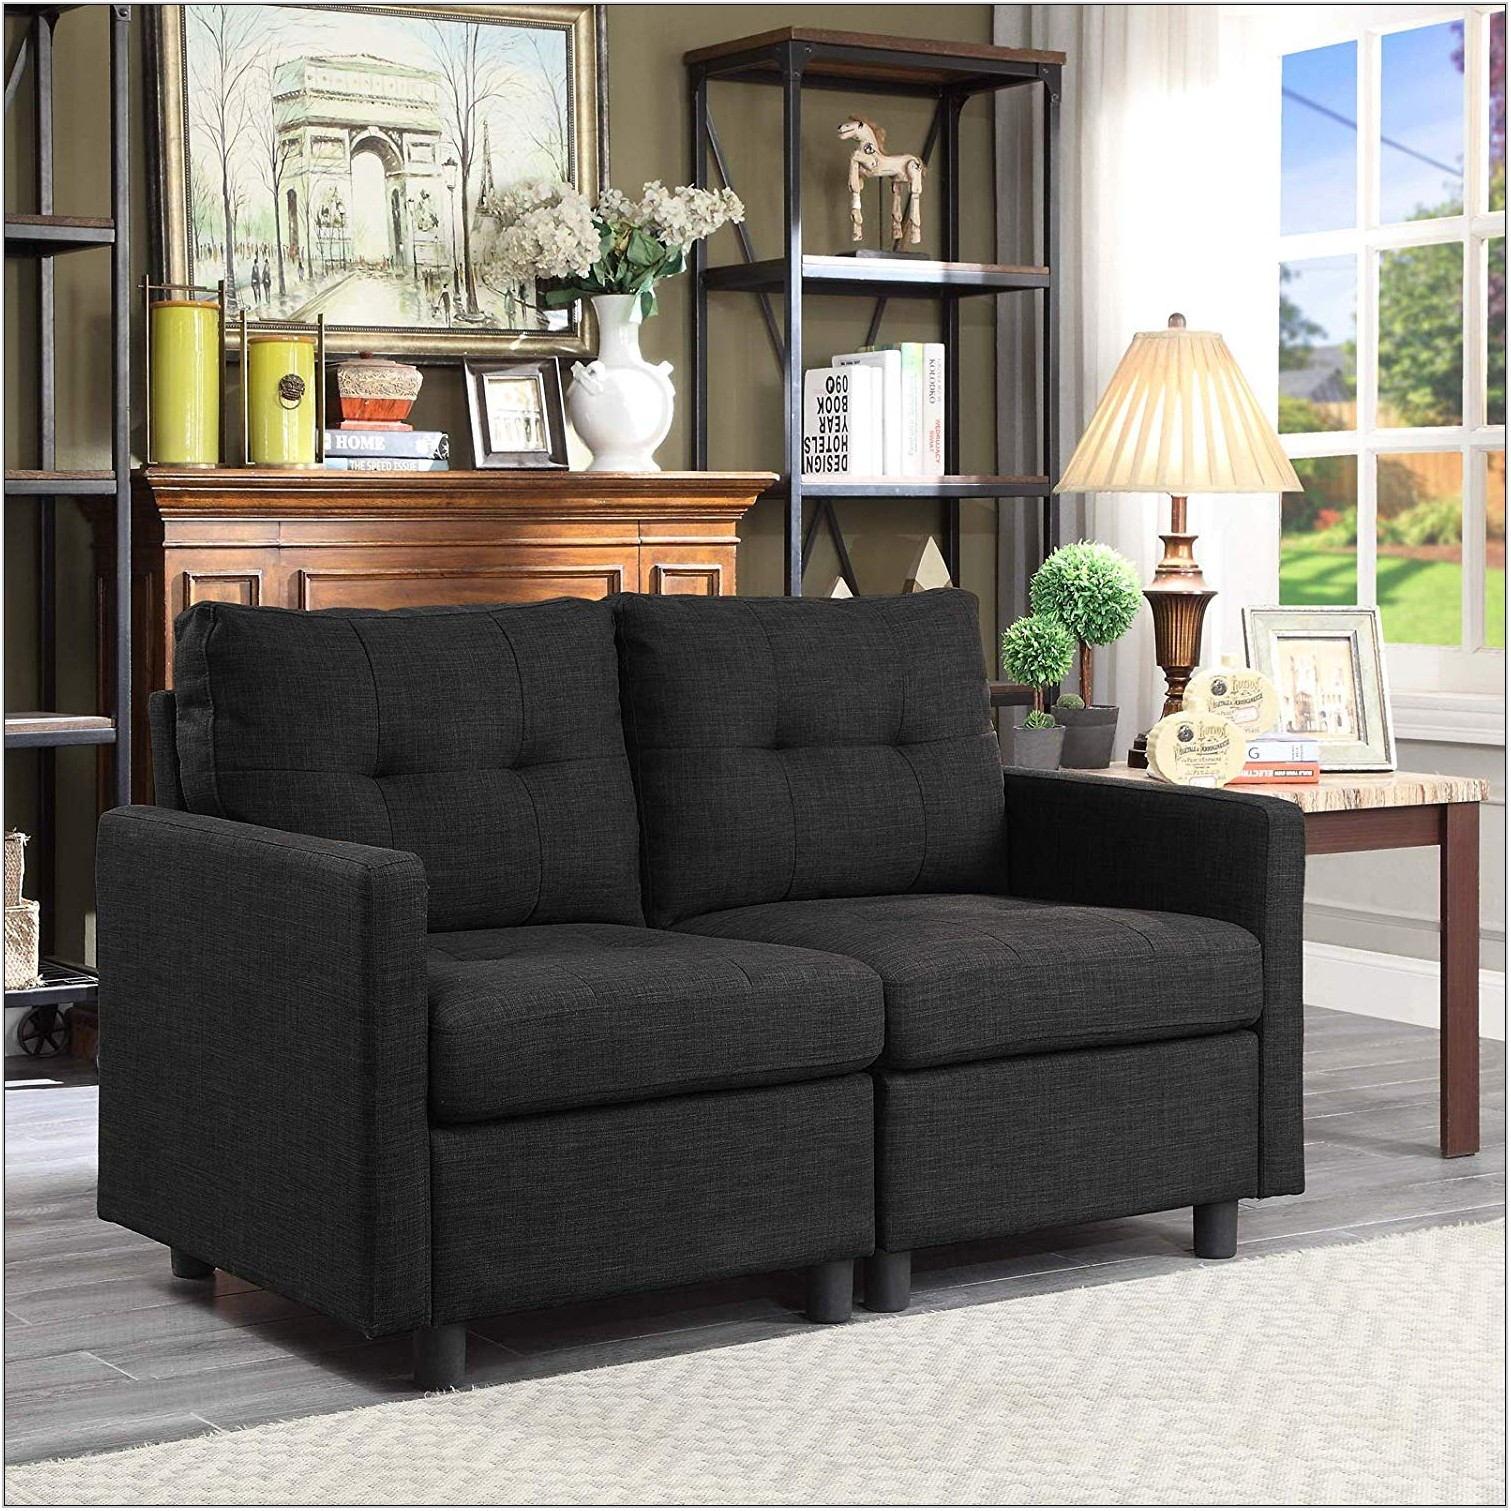 Modular Living Room Sets